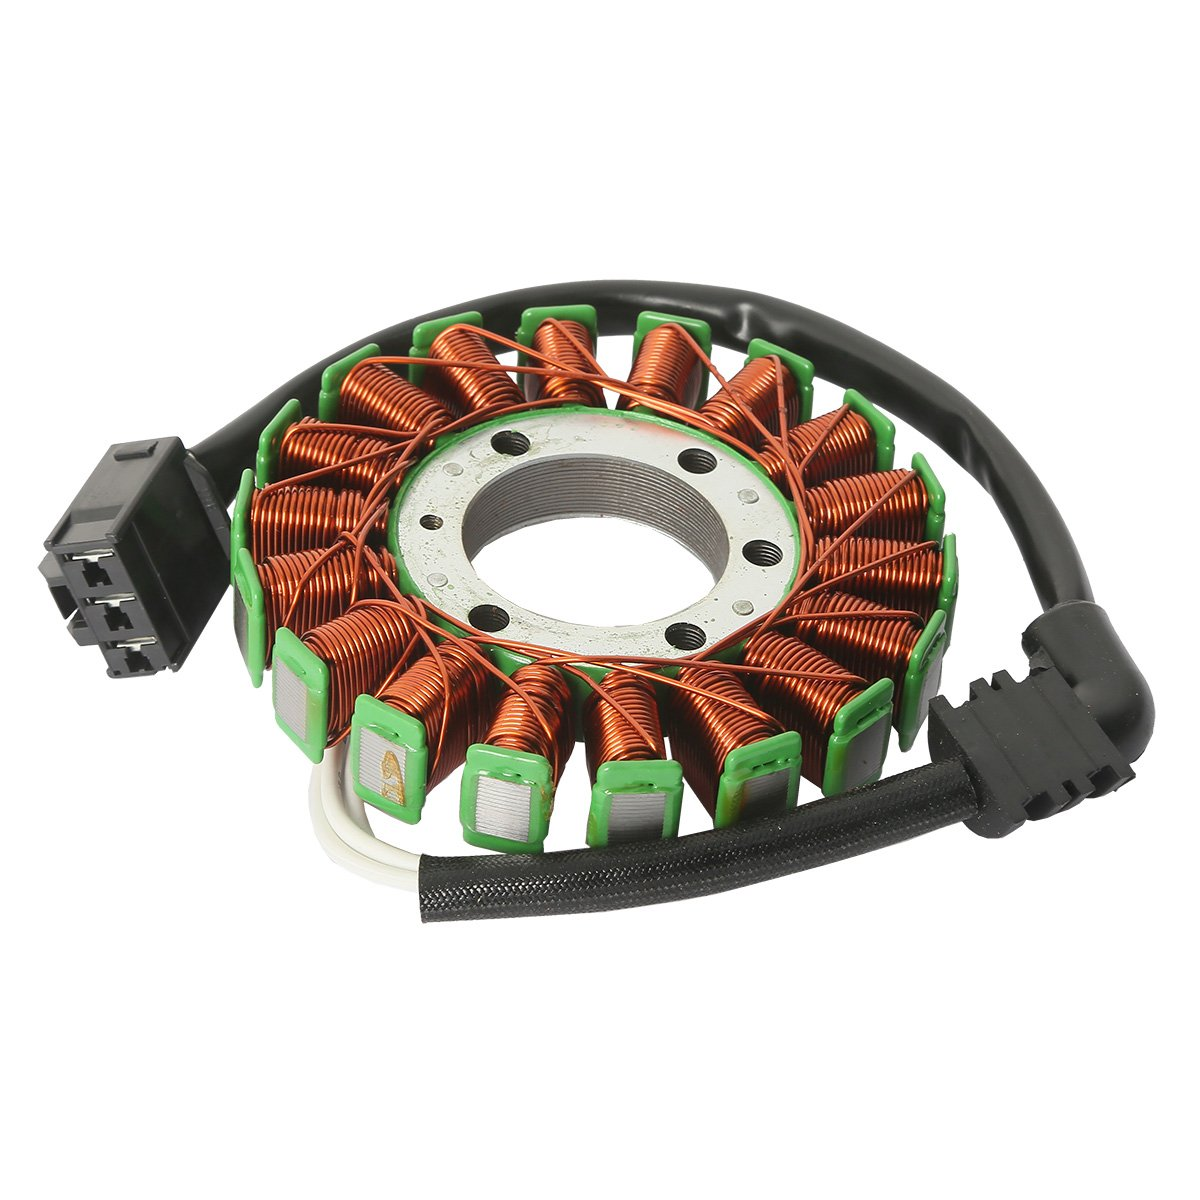 XFMT Ignition Motor Lichtmaschine Magneto Generator Engine Alternator Stator Coil For 49cc 50cc 60cc 66cc 80cc 2-Stroke Motorized Bike